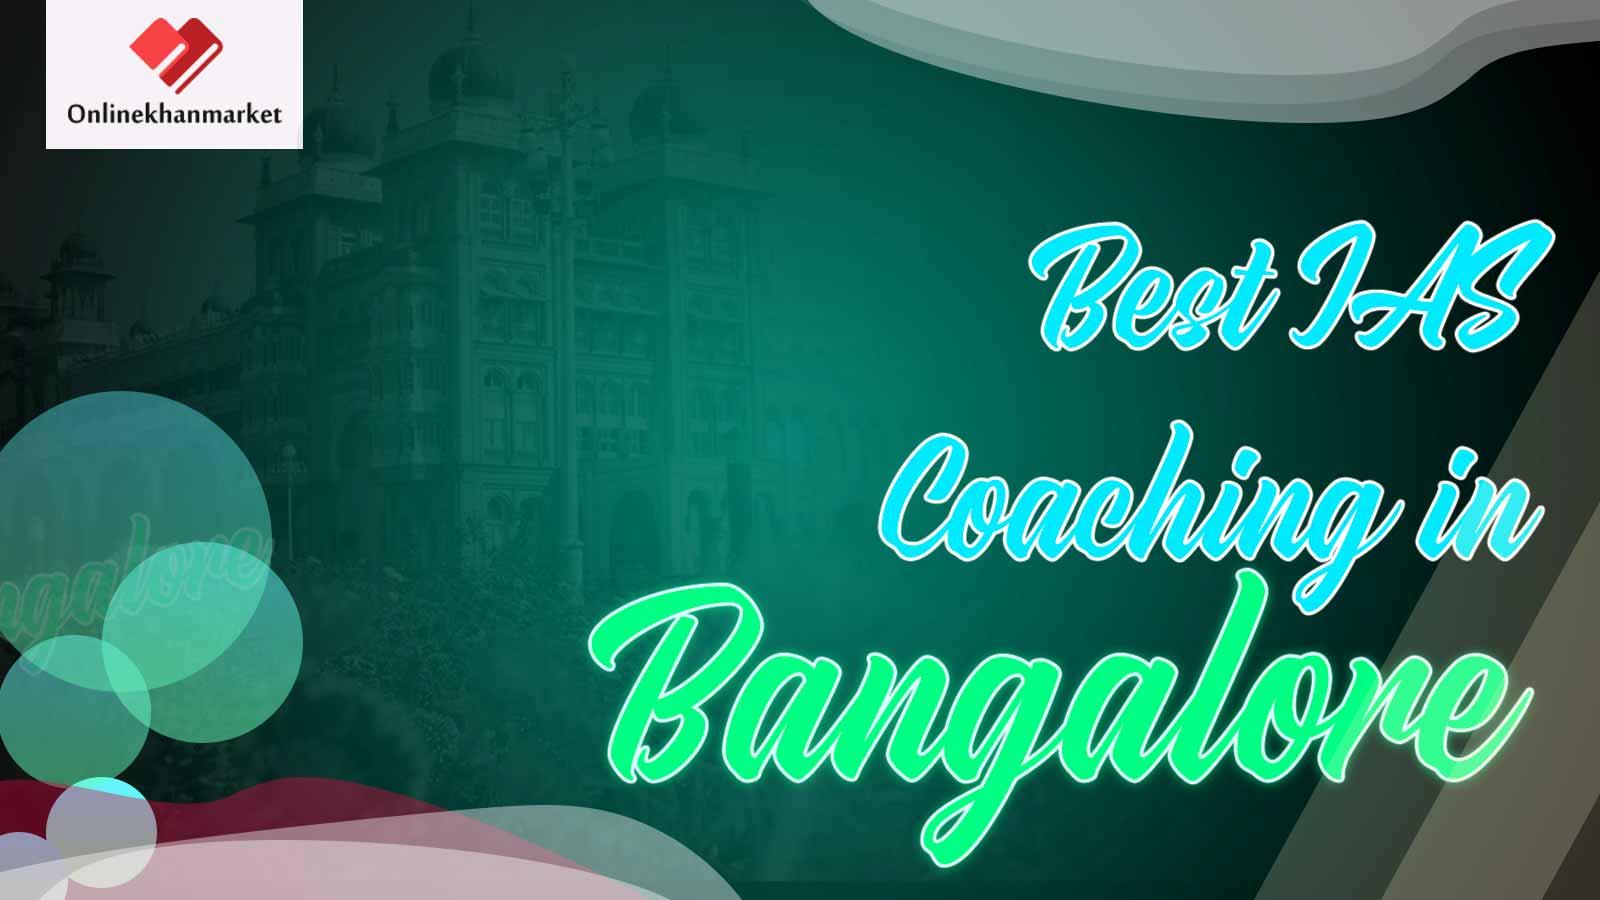 Best IAS Coaching in Bangalore